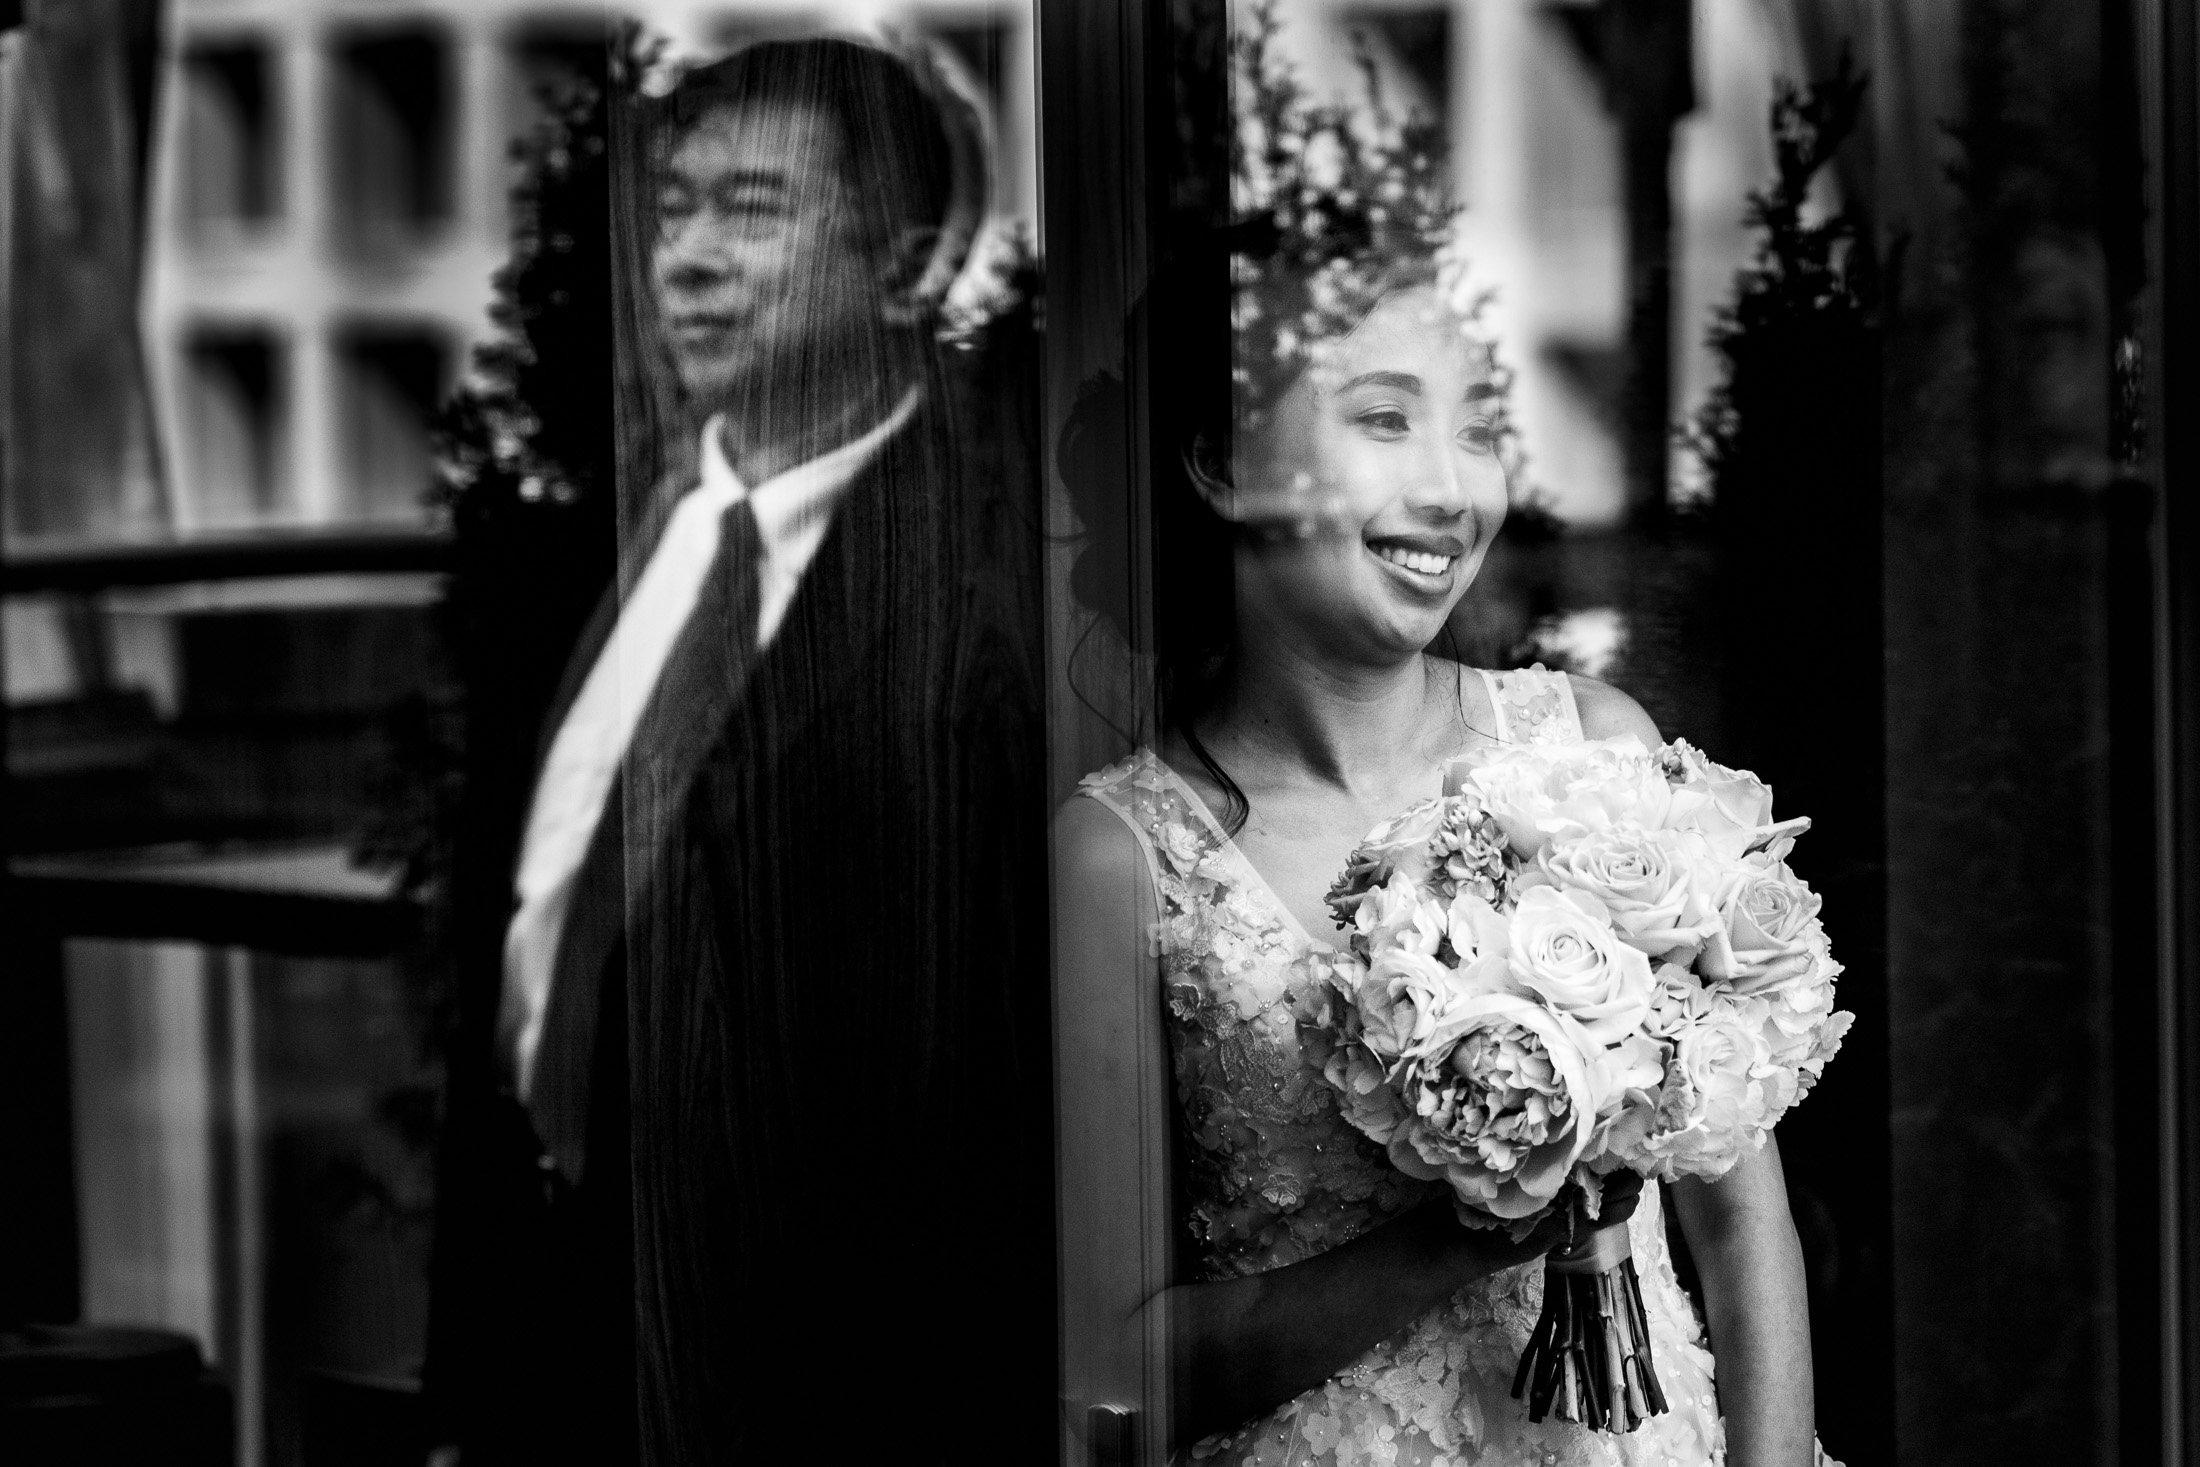 006 - shangri-la vancouver wedding ceremony